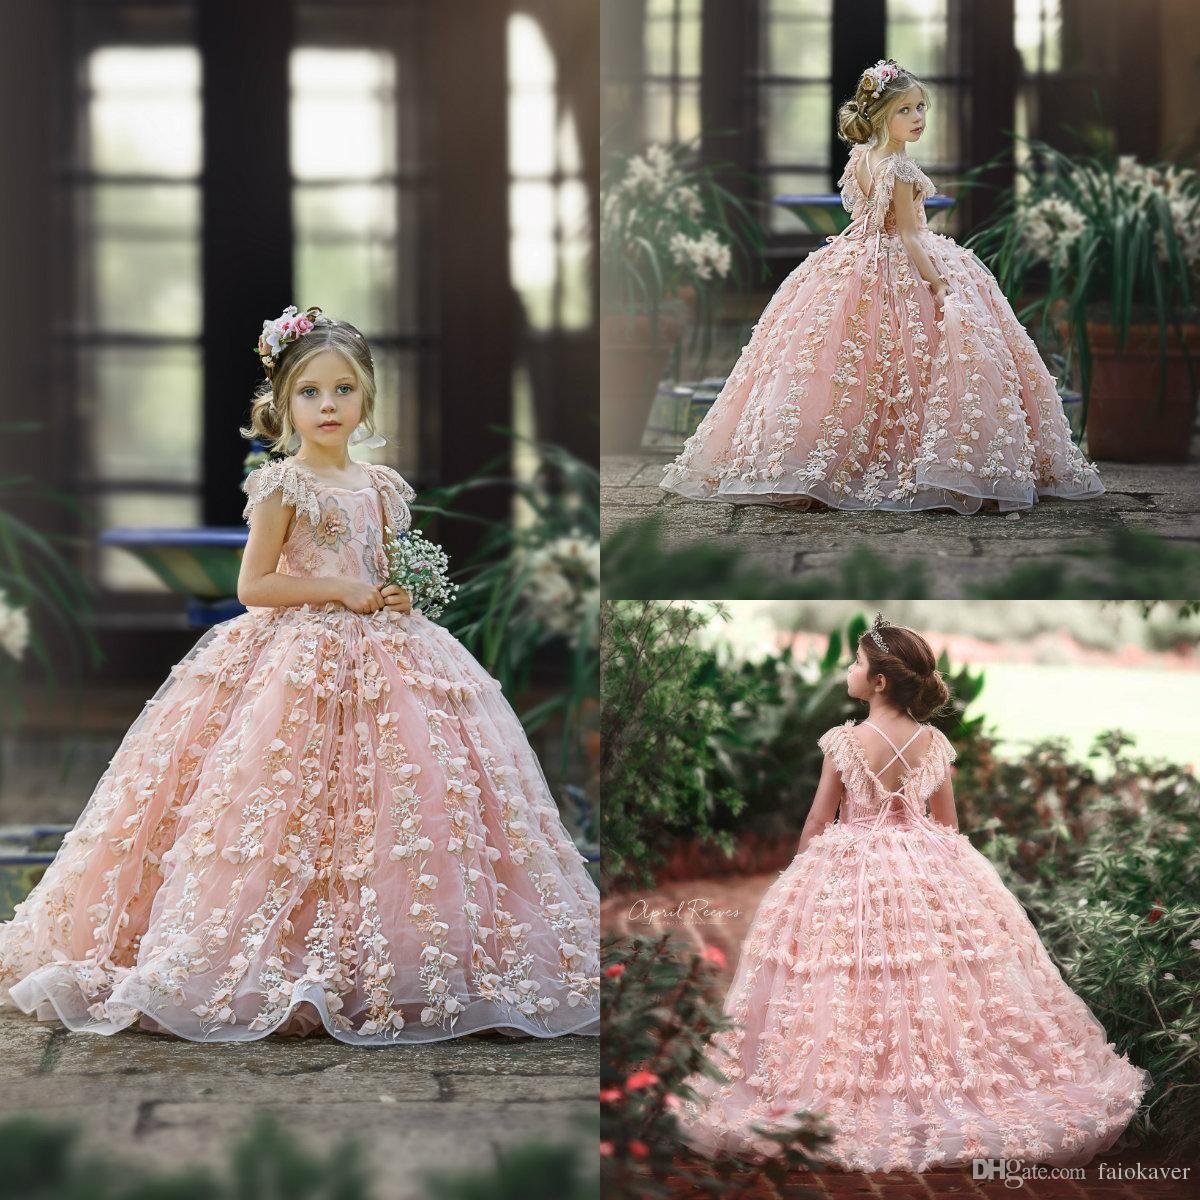 20 Cute Girl Dresses Images 38 in 2020 Kids long dress